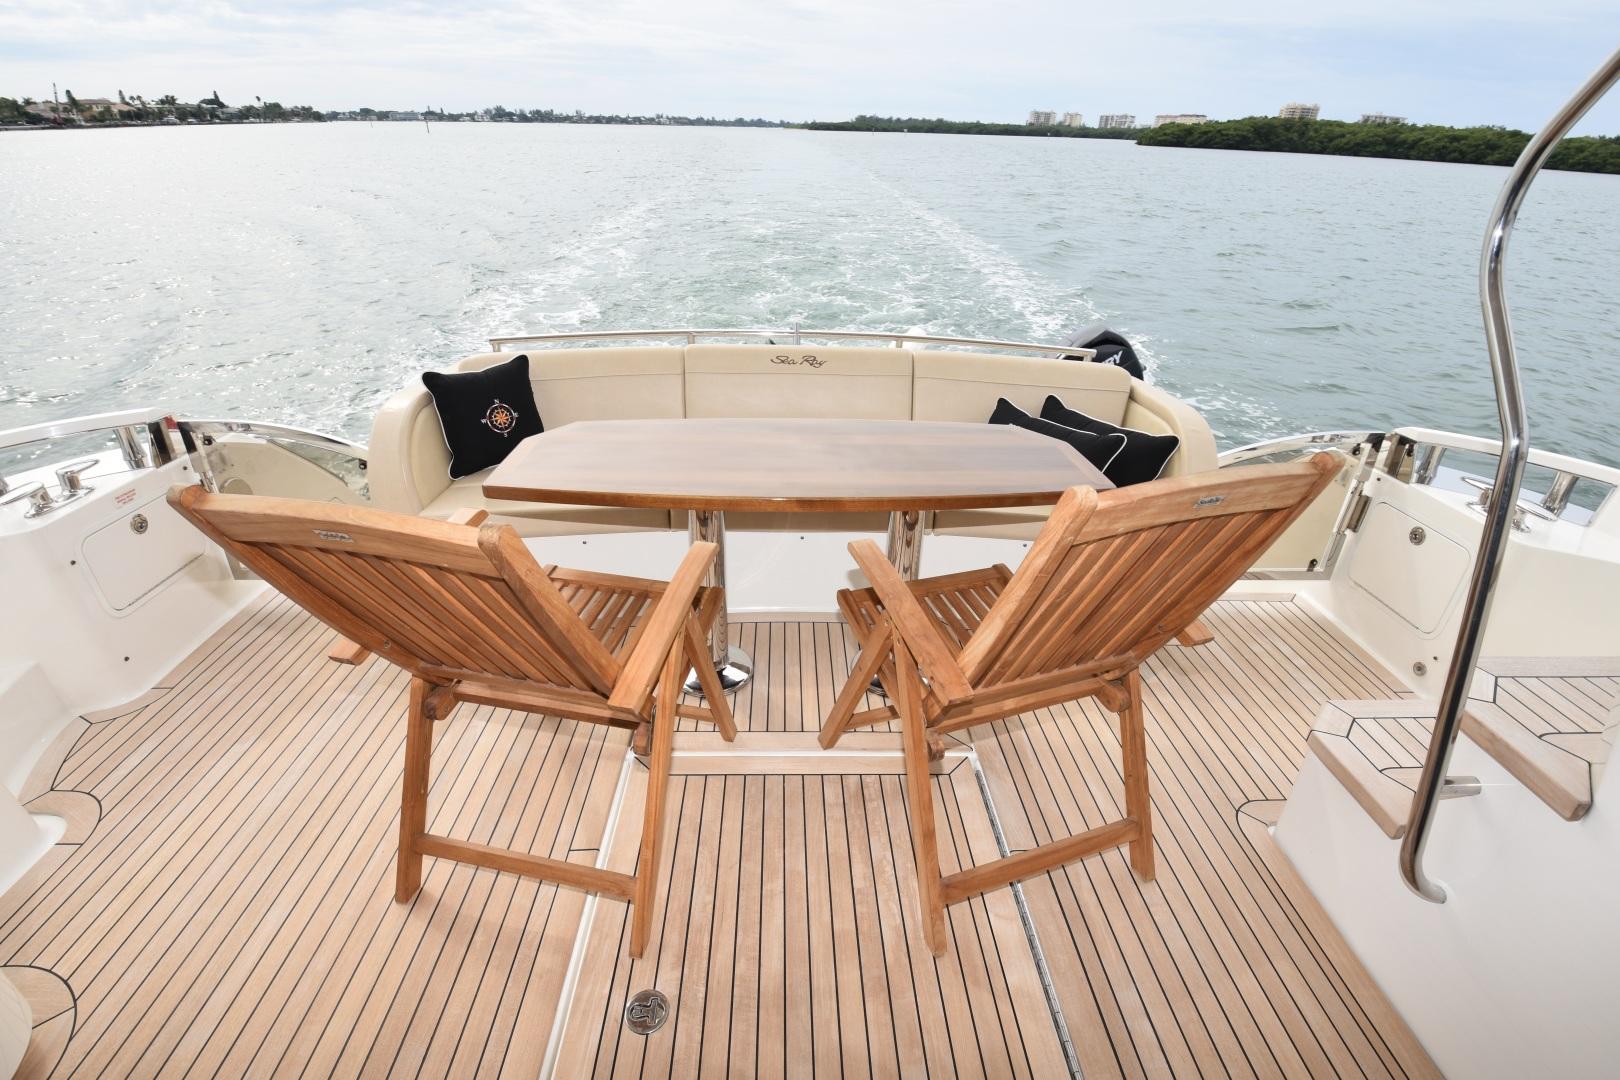 Sea Ray-L650 2016-3x's the Charm Longboat Key-Florida-United States-2016 Sea Ray L650  3x's the Charm  Aft Cockpit-1251836 | Thumbnail